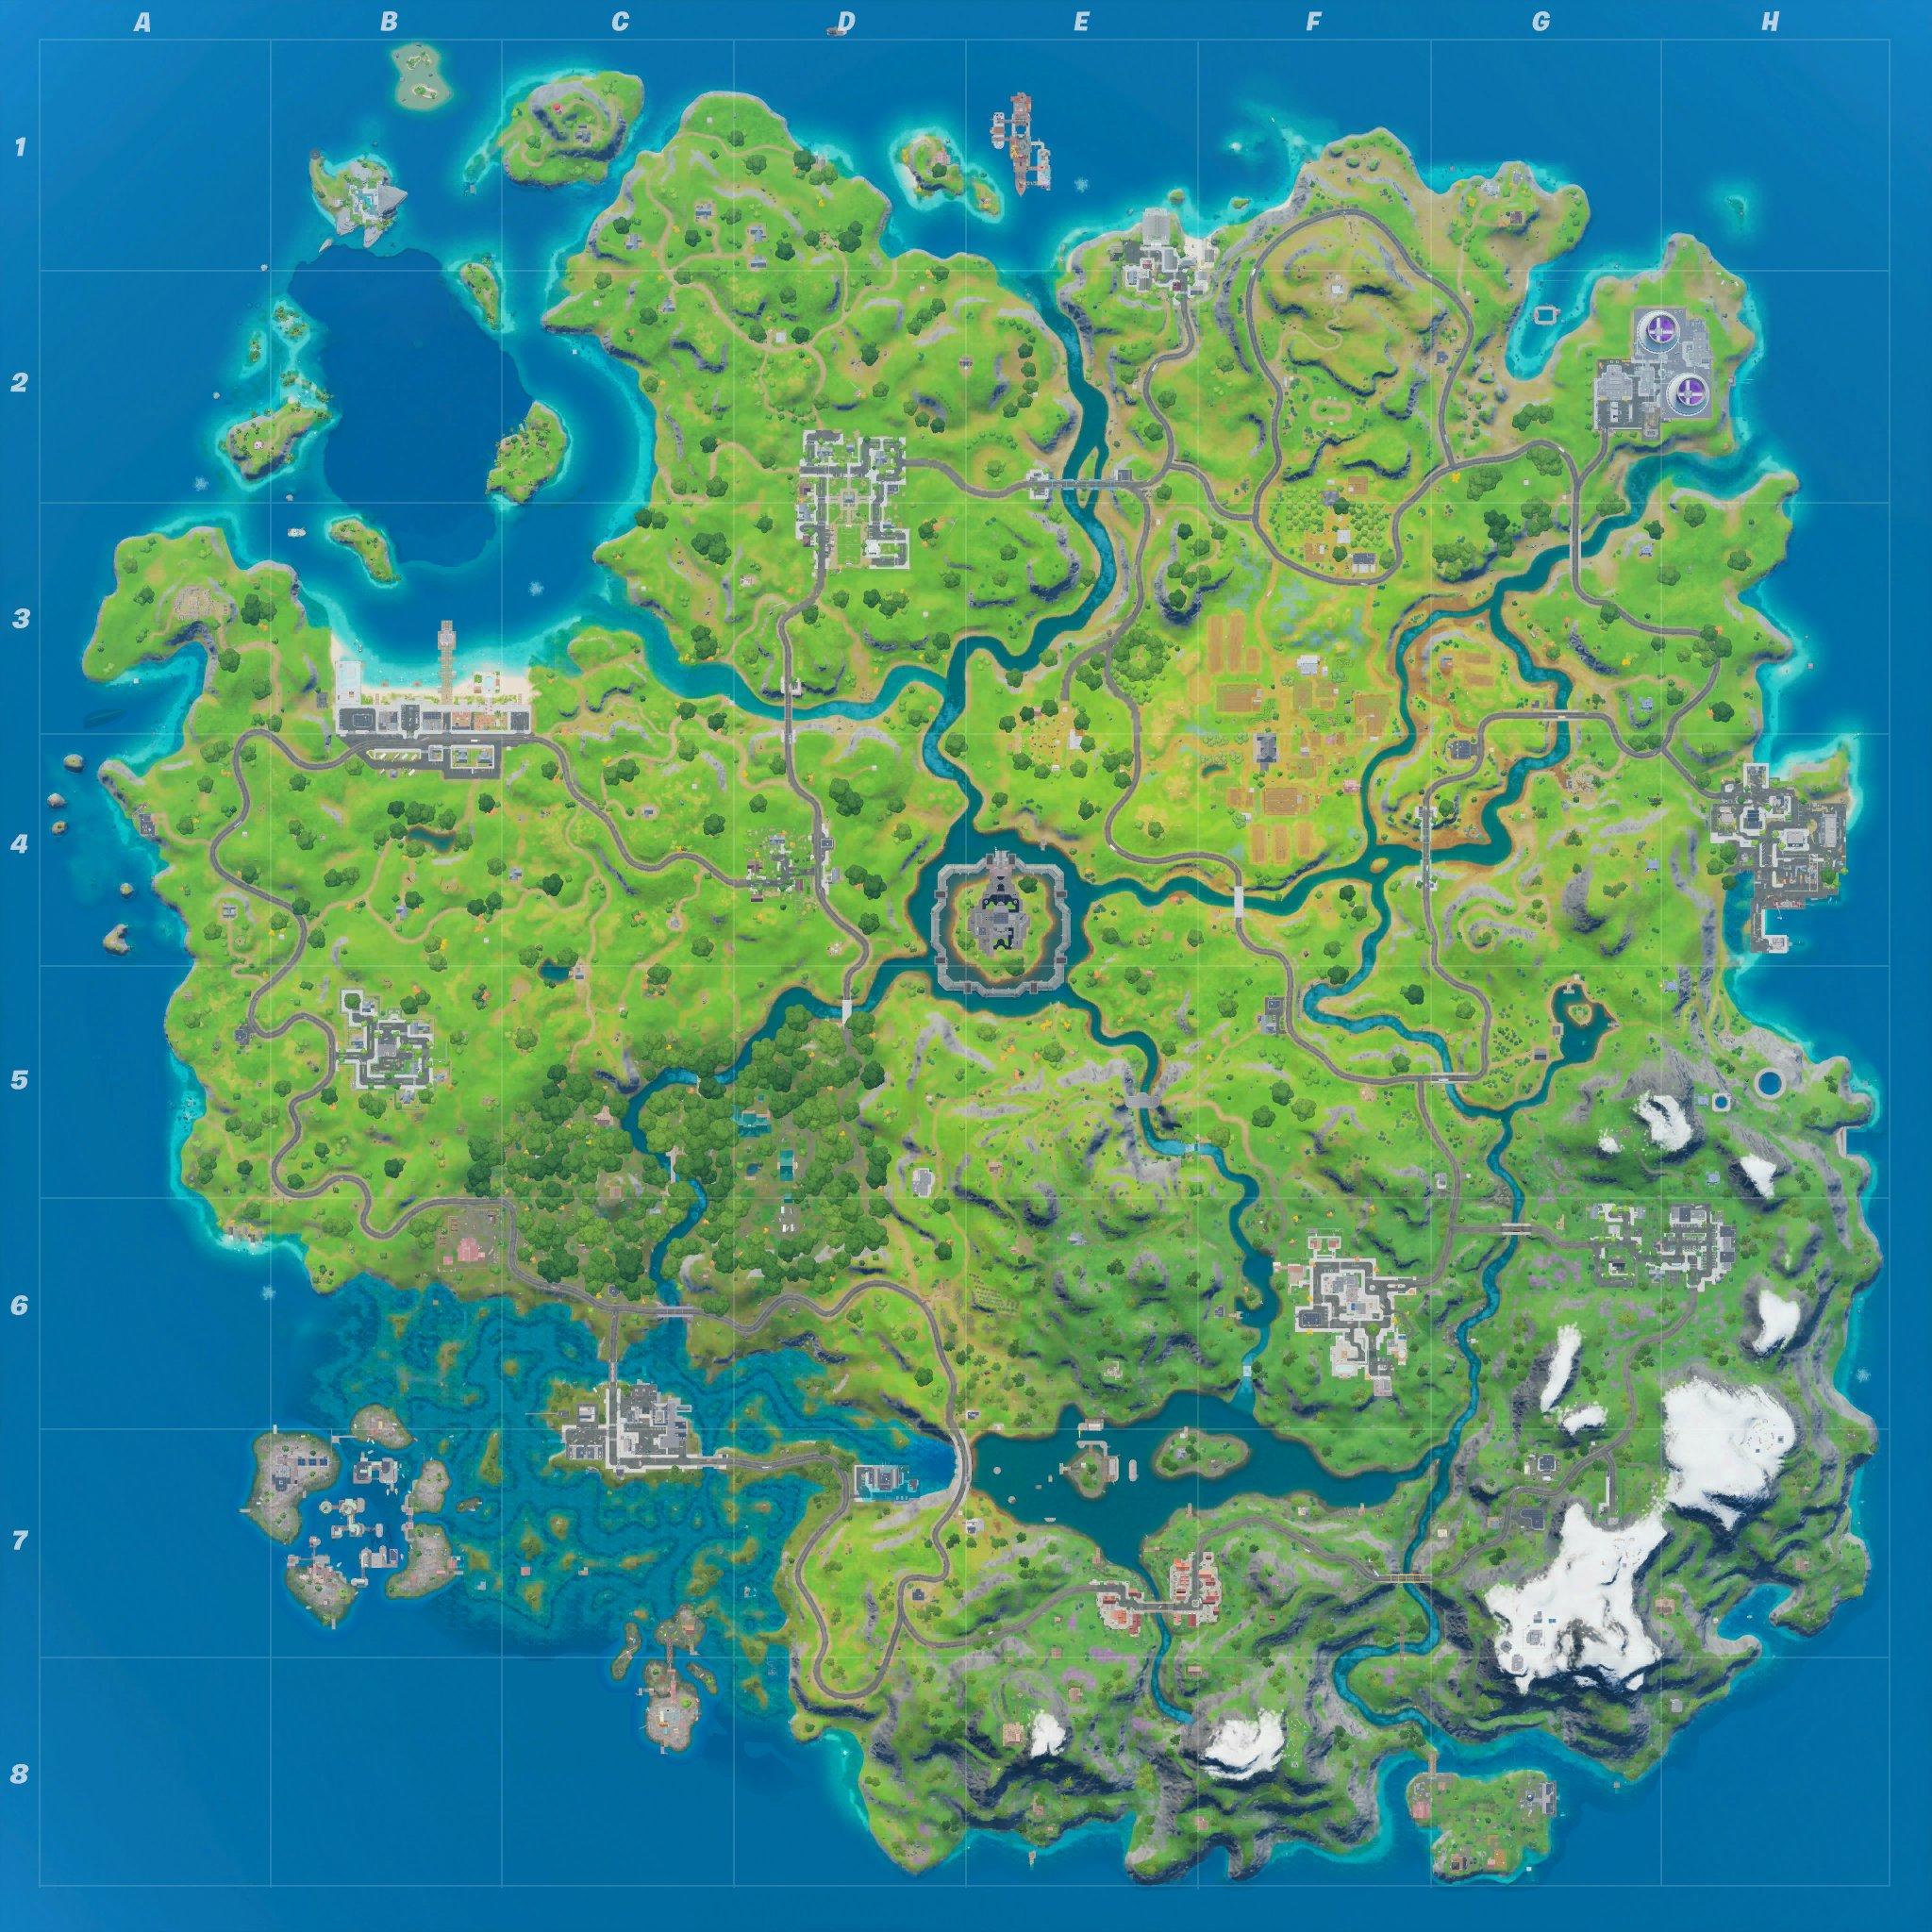 Fortnite penultimate map expansion.